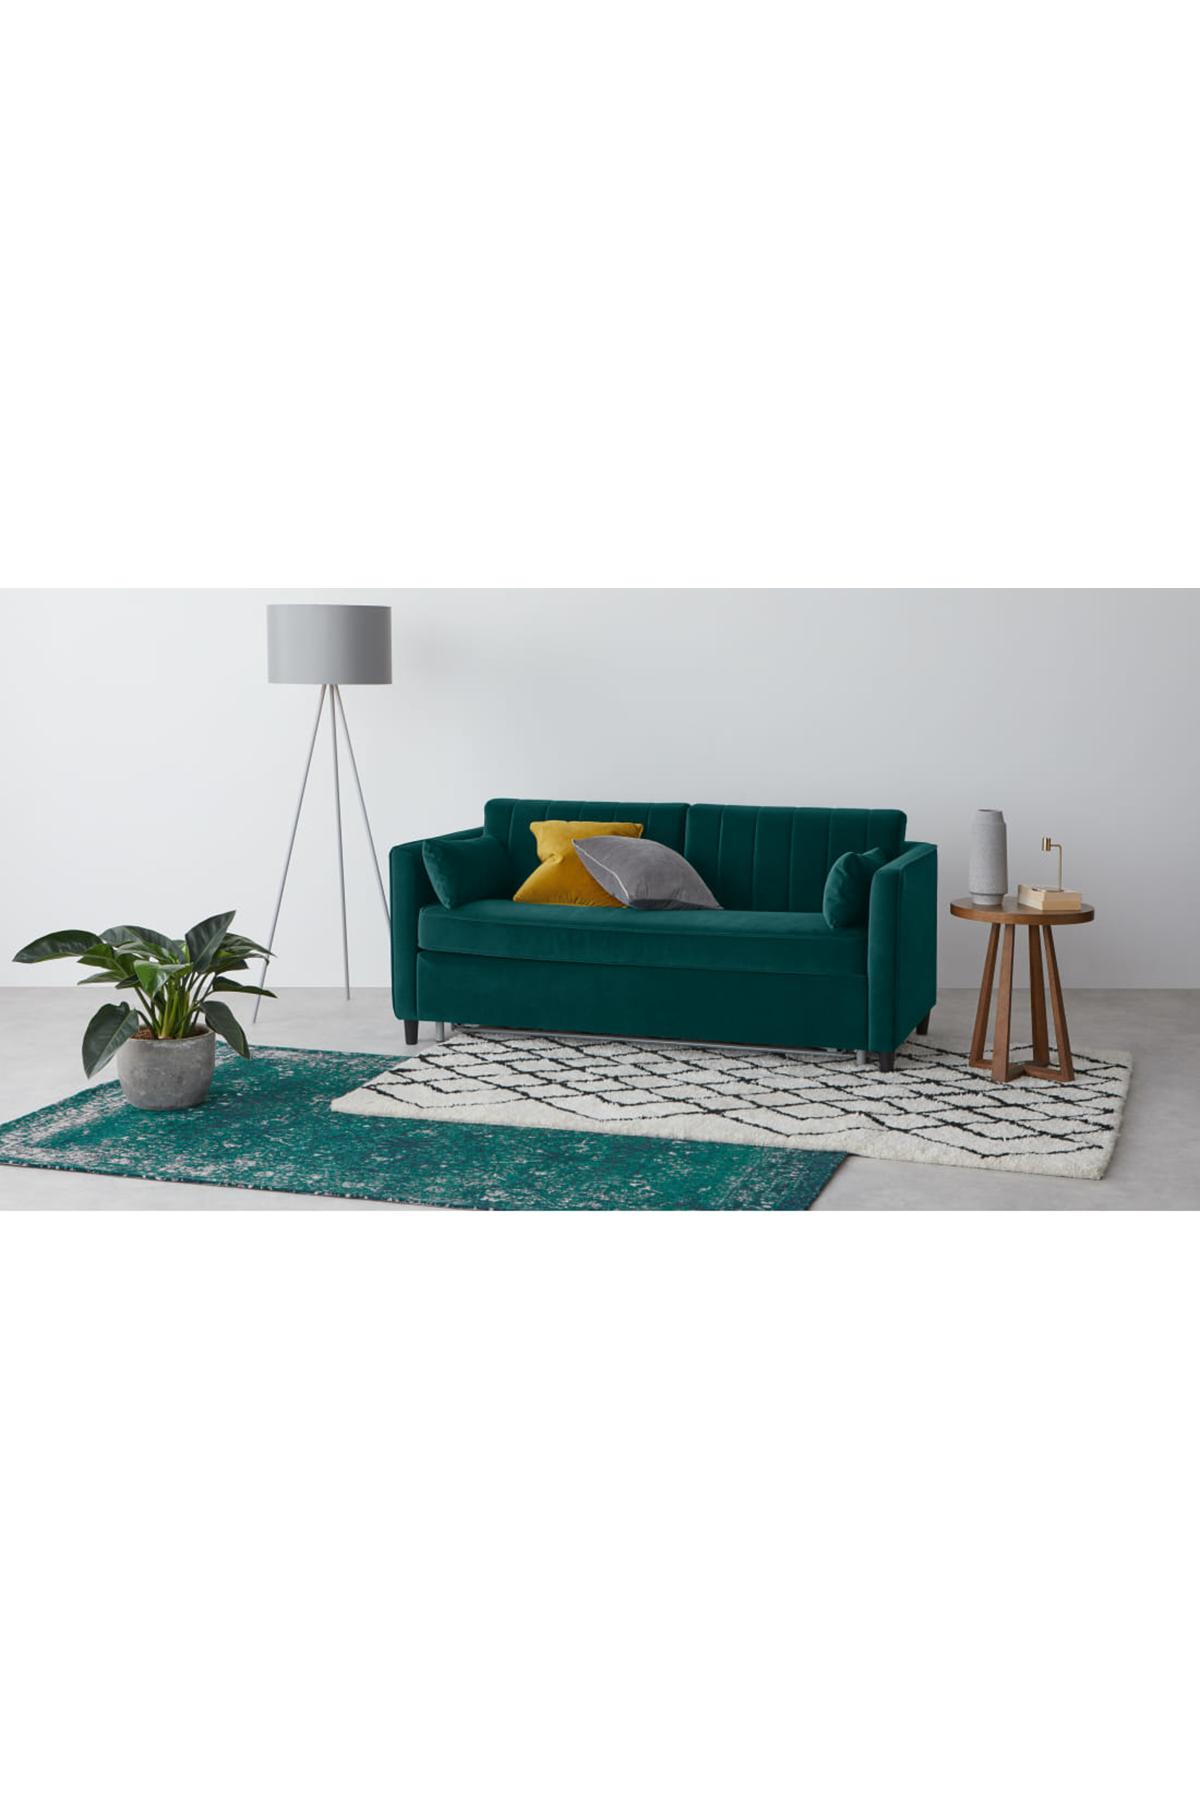 Super Barrow Sofa Bed Seafoam Blue Velvet In 2019 Sofa Sofa Cjindustries Chair Design For Home Cjindustriesco